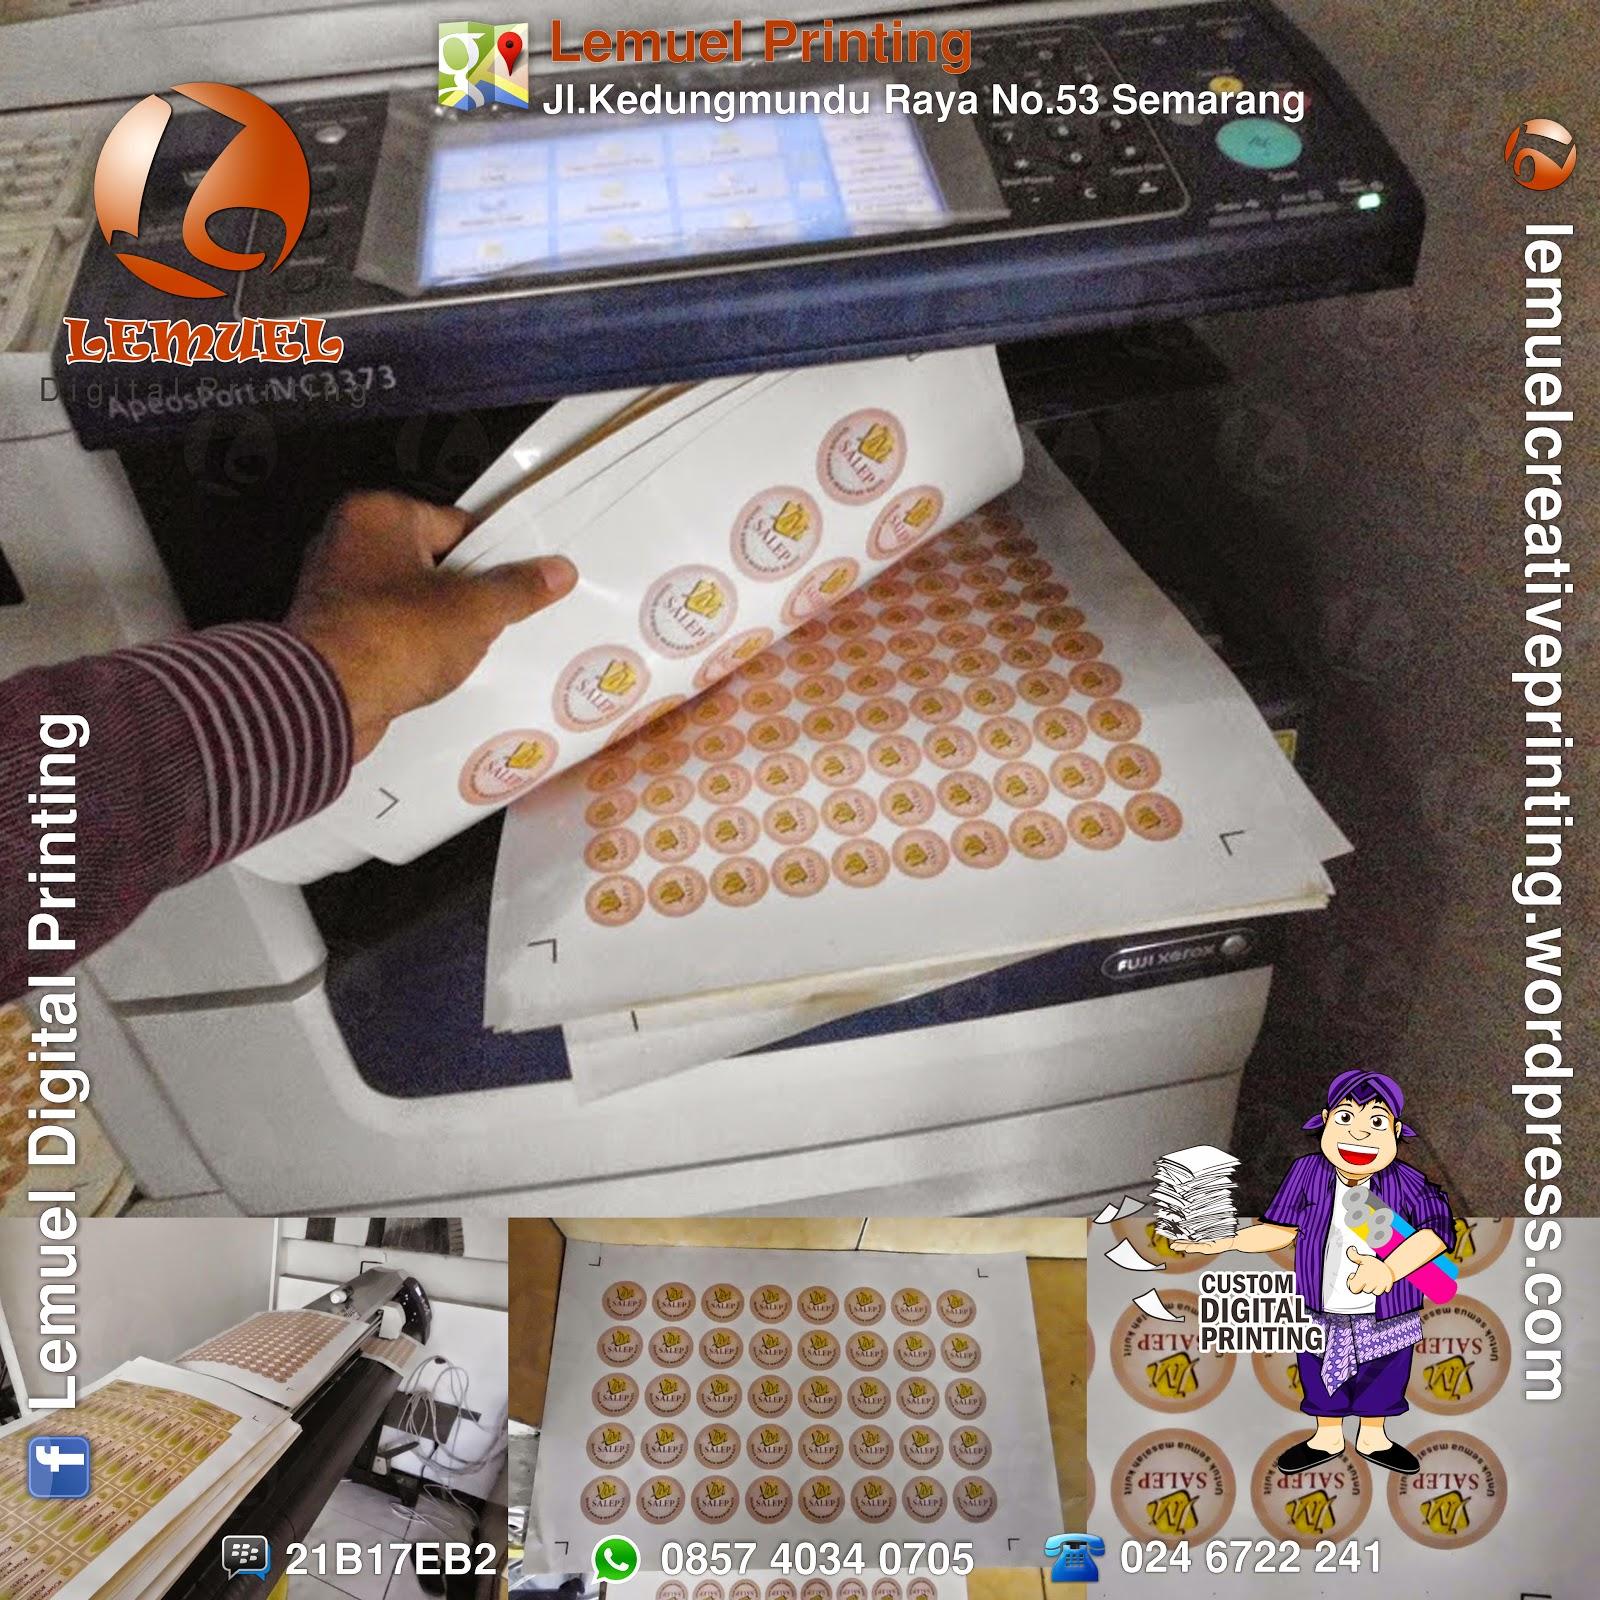 A3 Sticker Printing